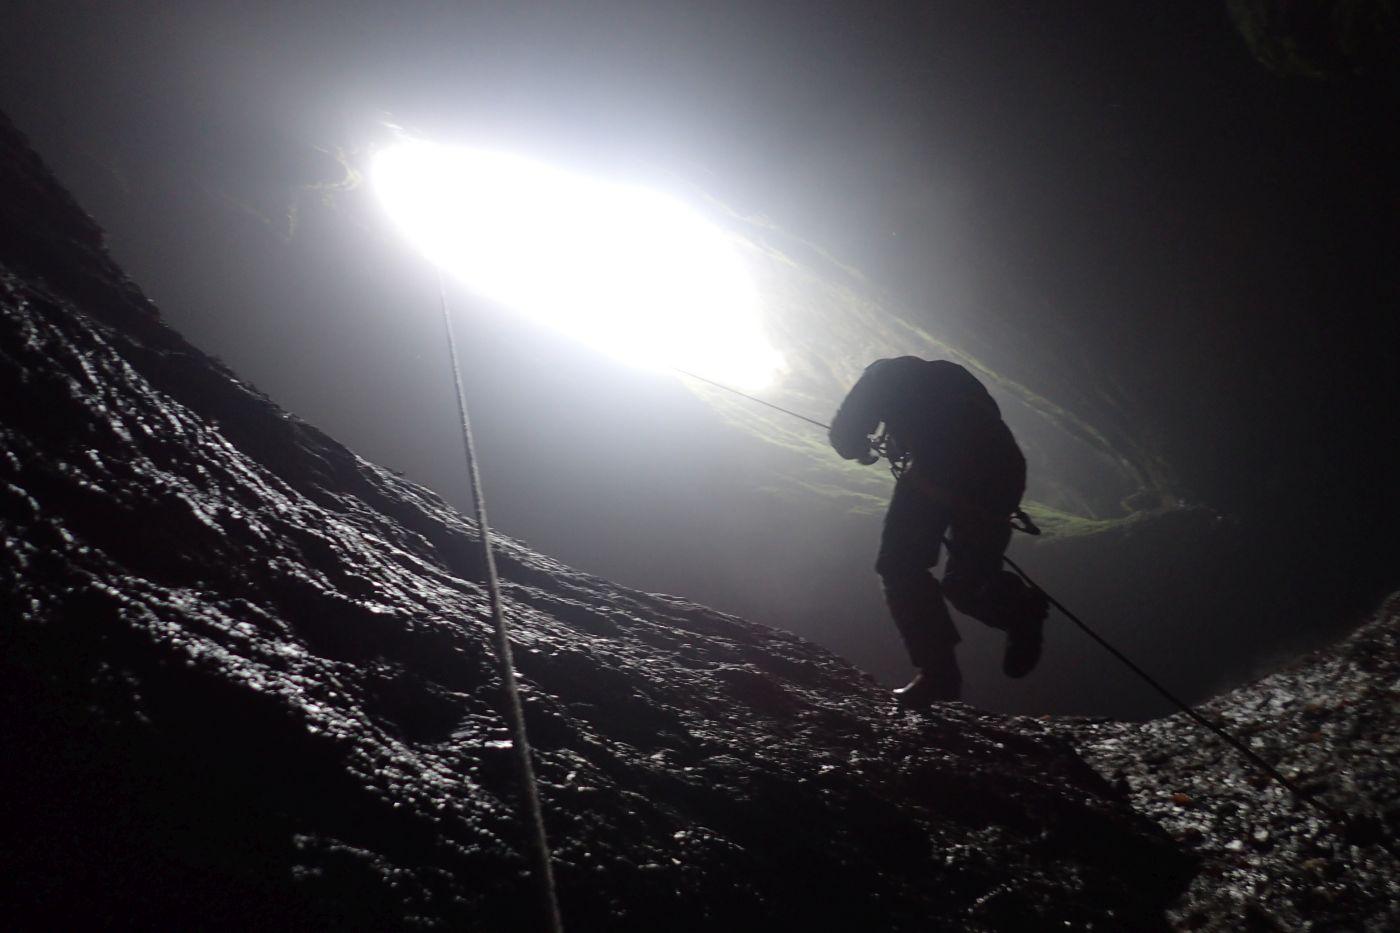 Izlazak iz jame (foto: Damir Janton)